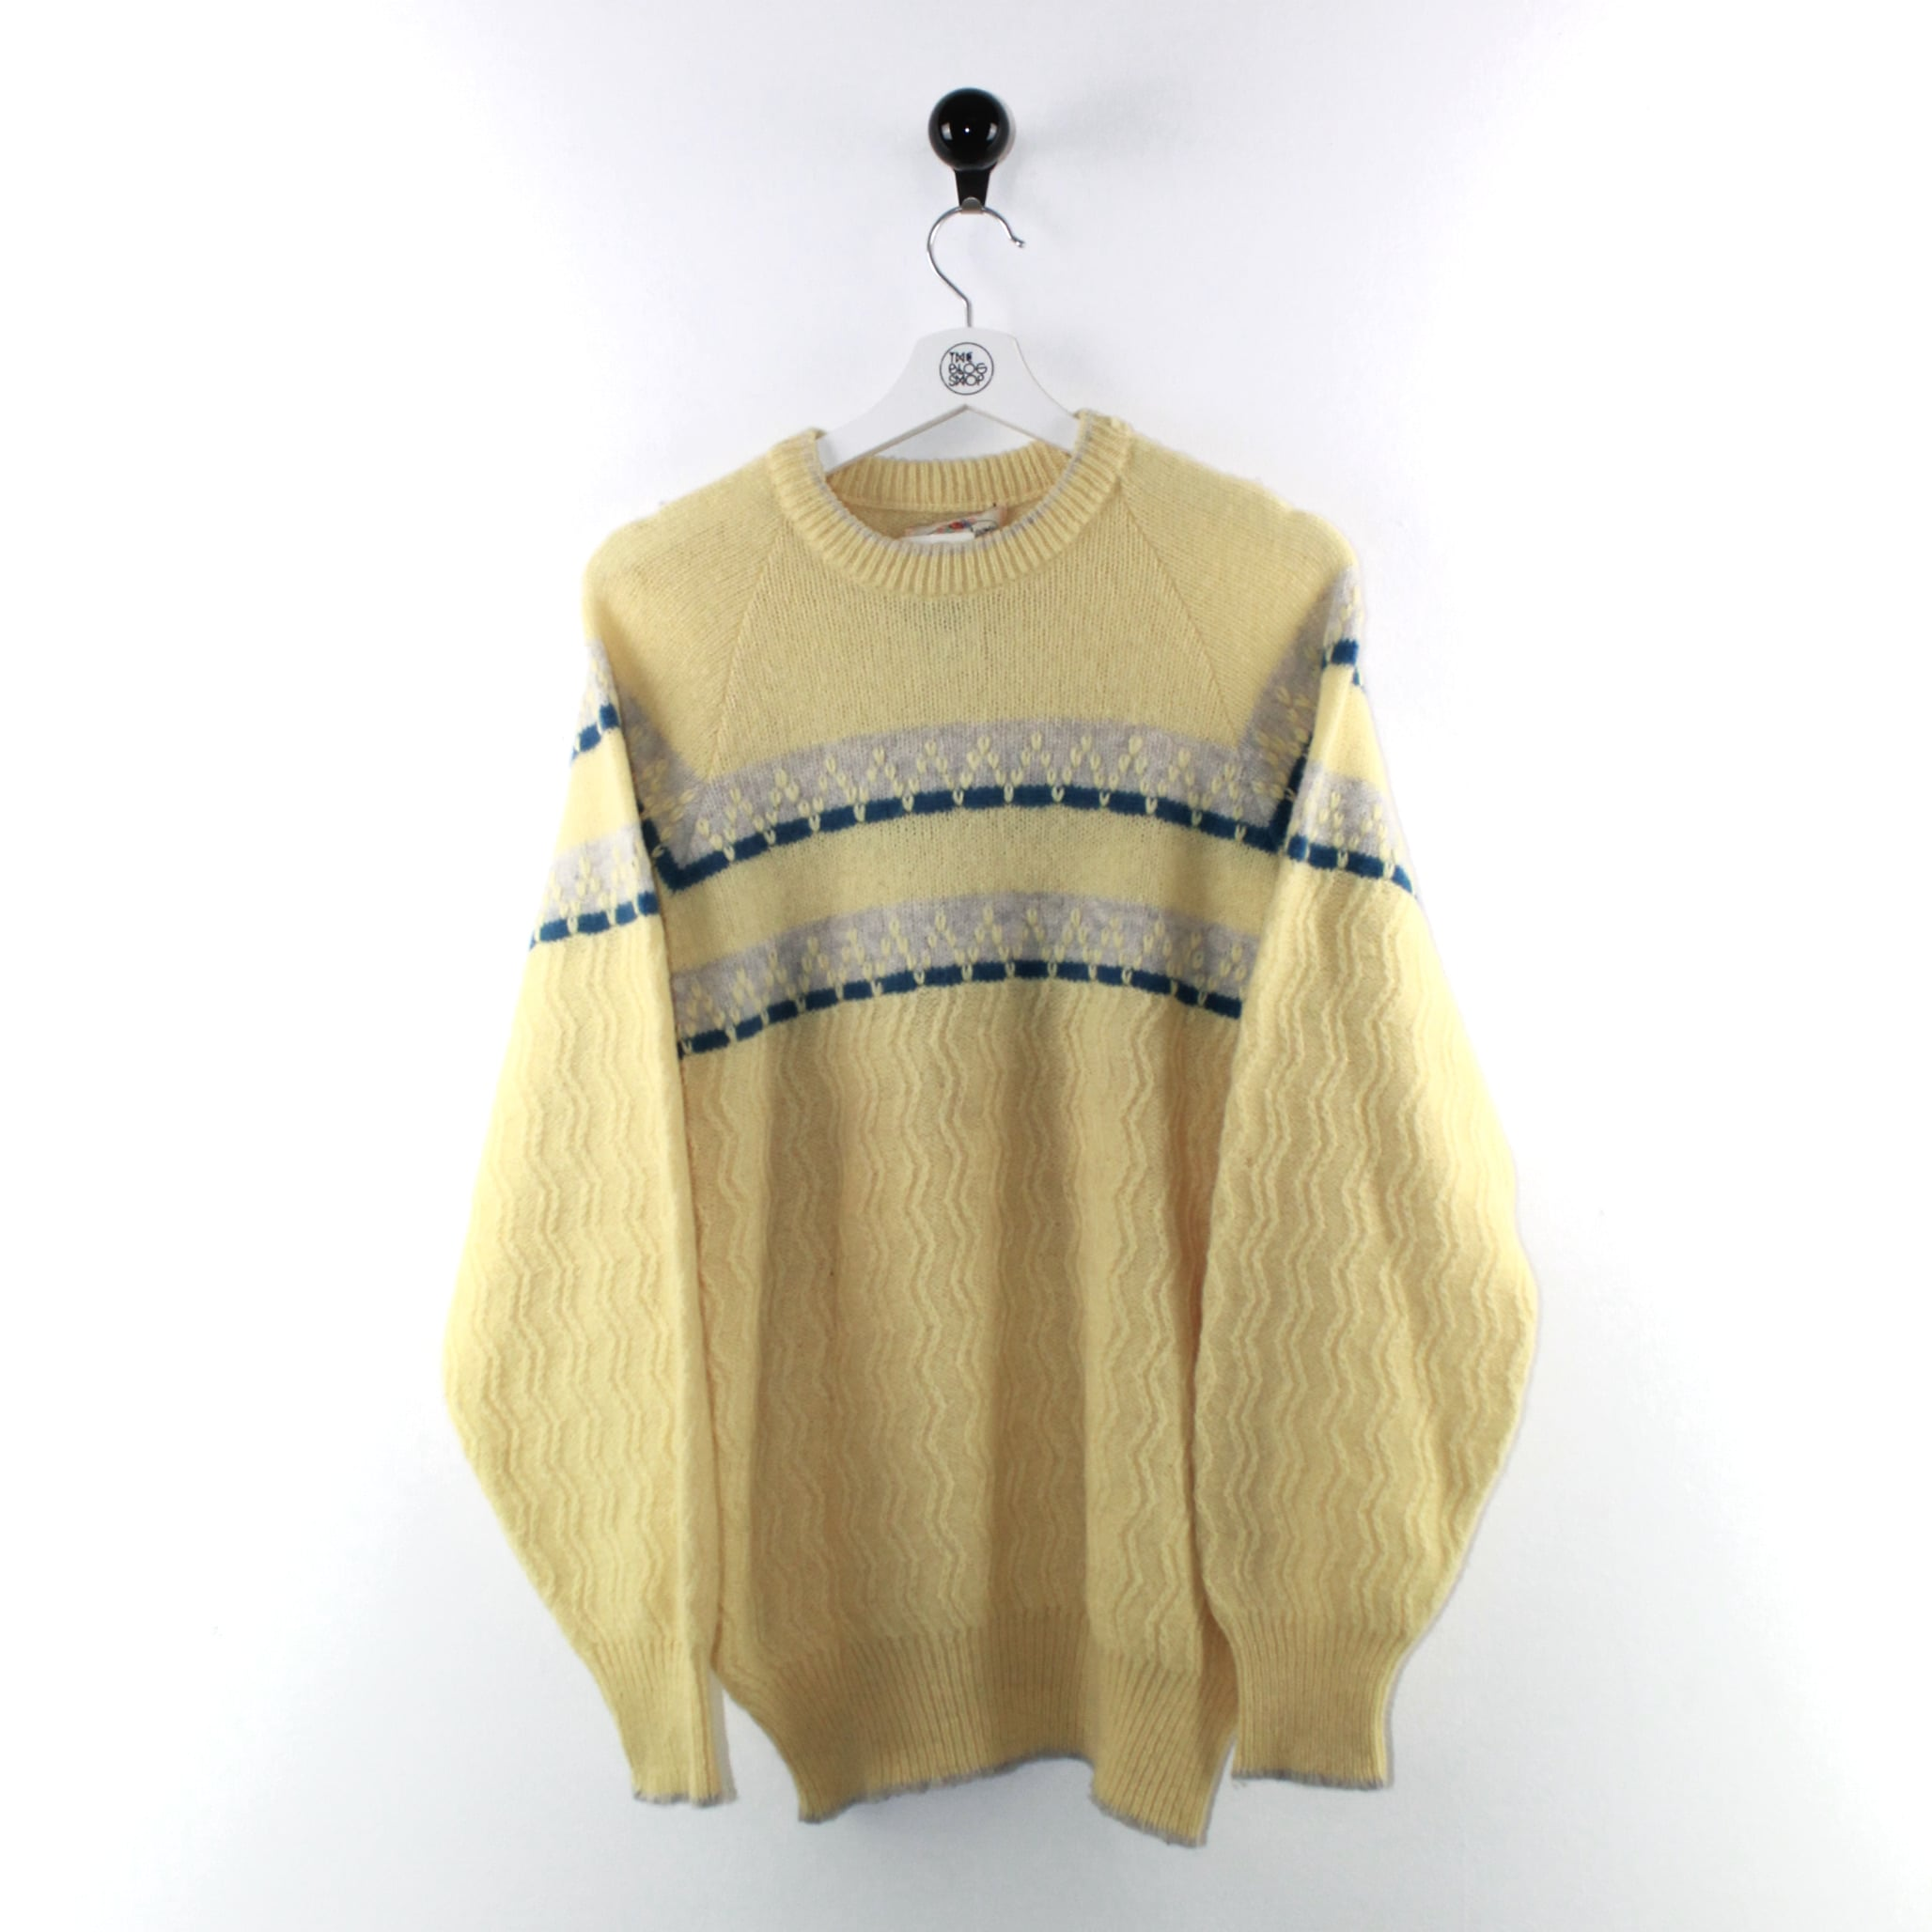 Maglia fantasia 100% lana vergine